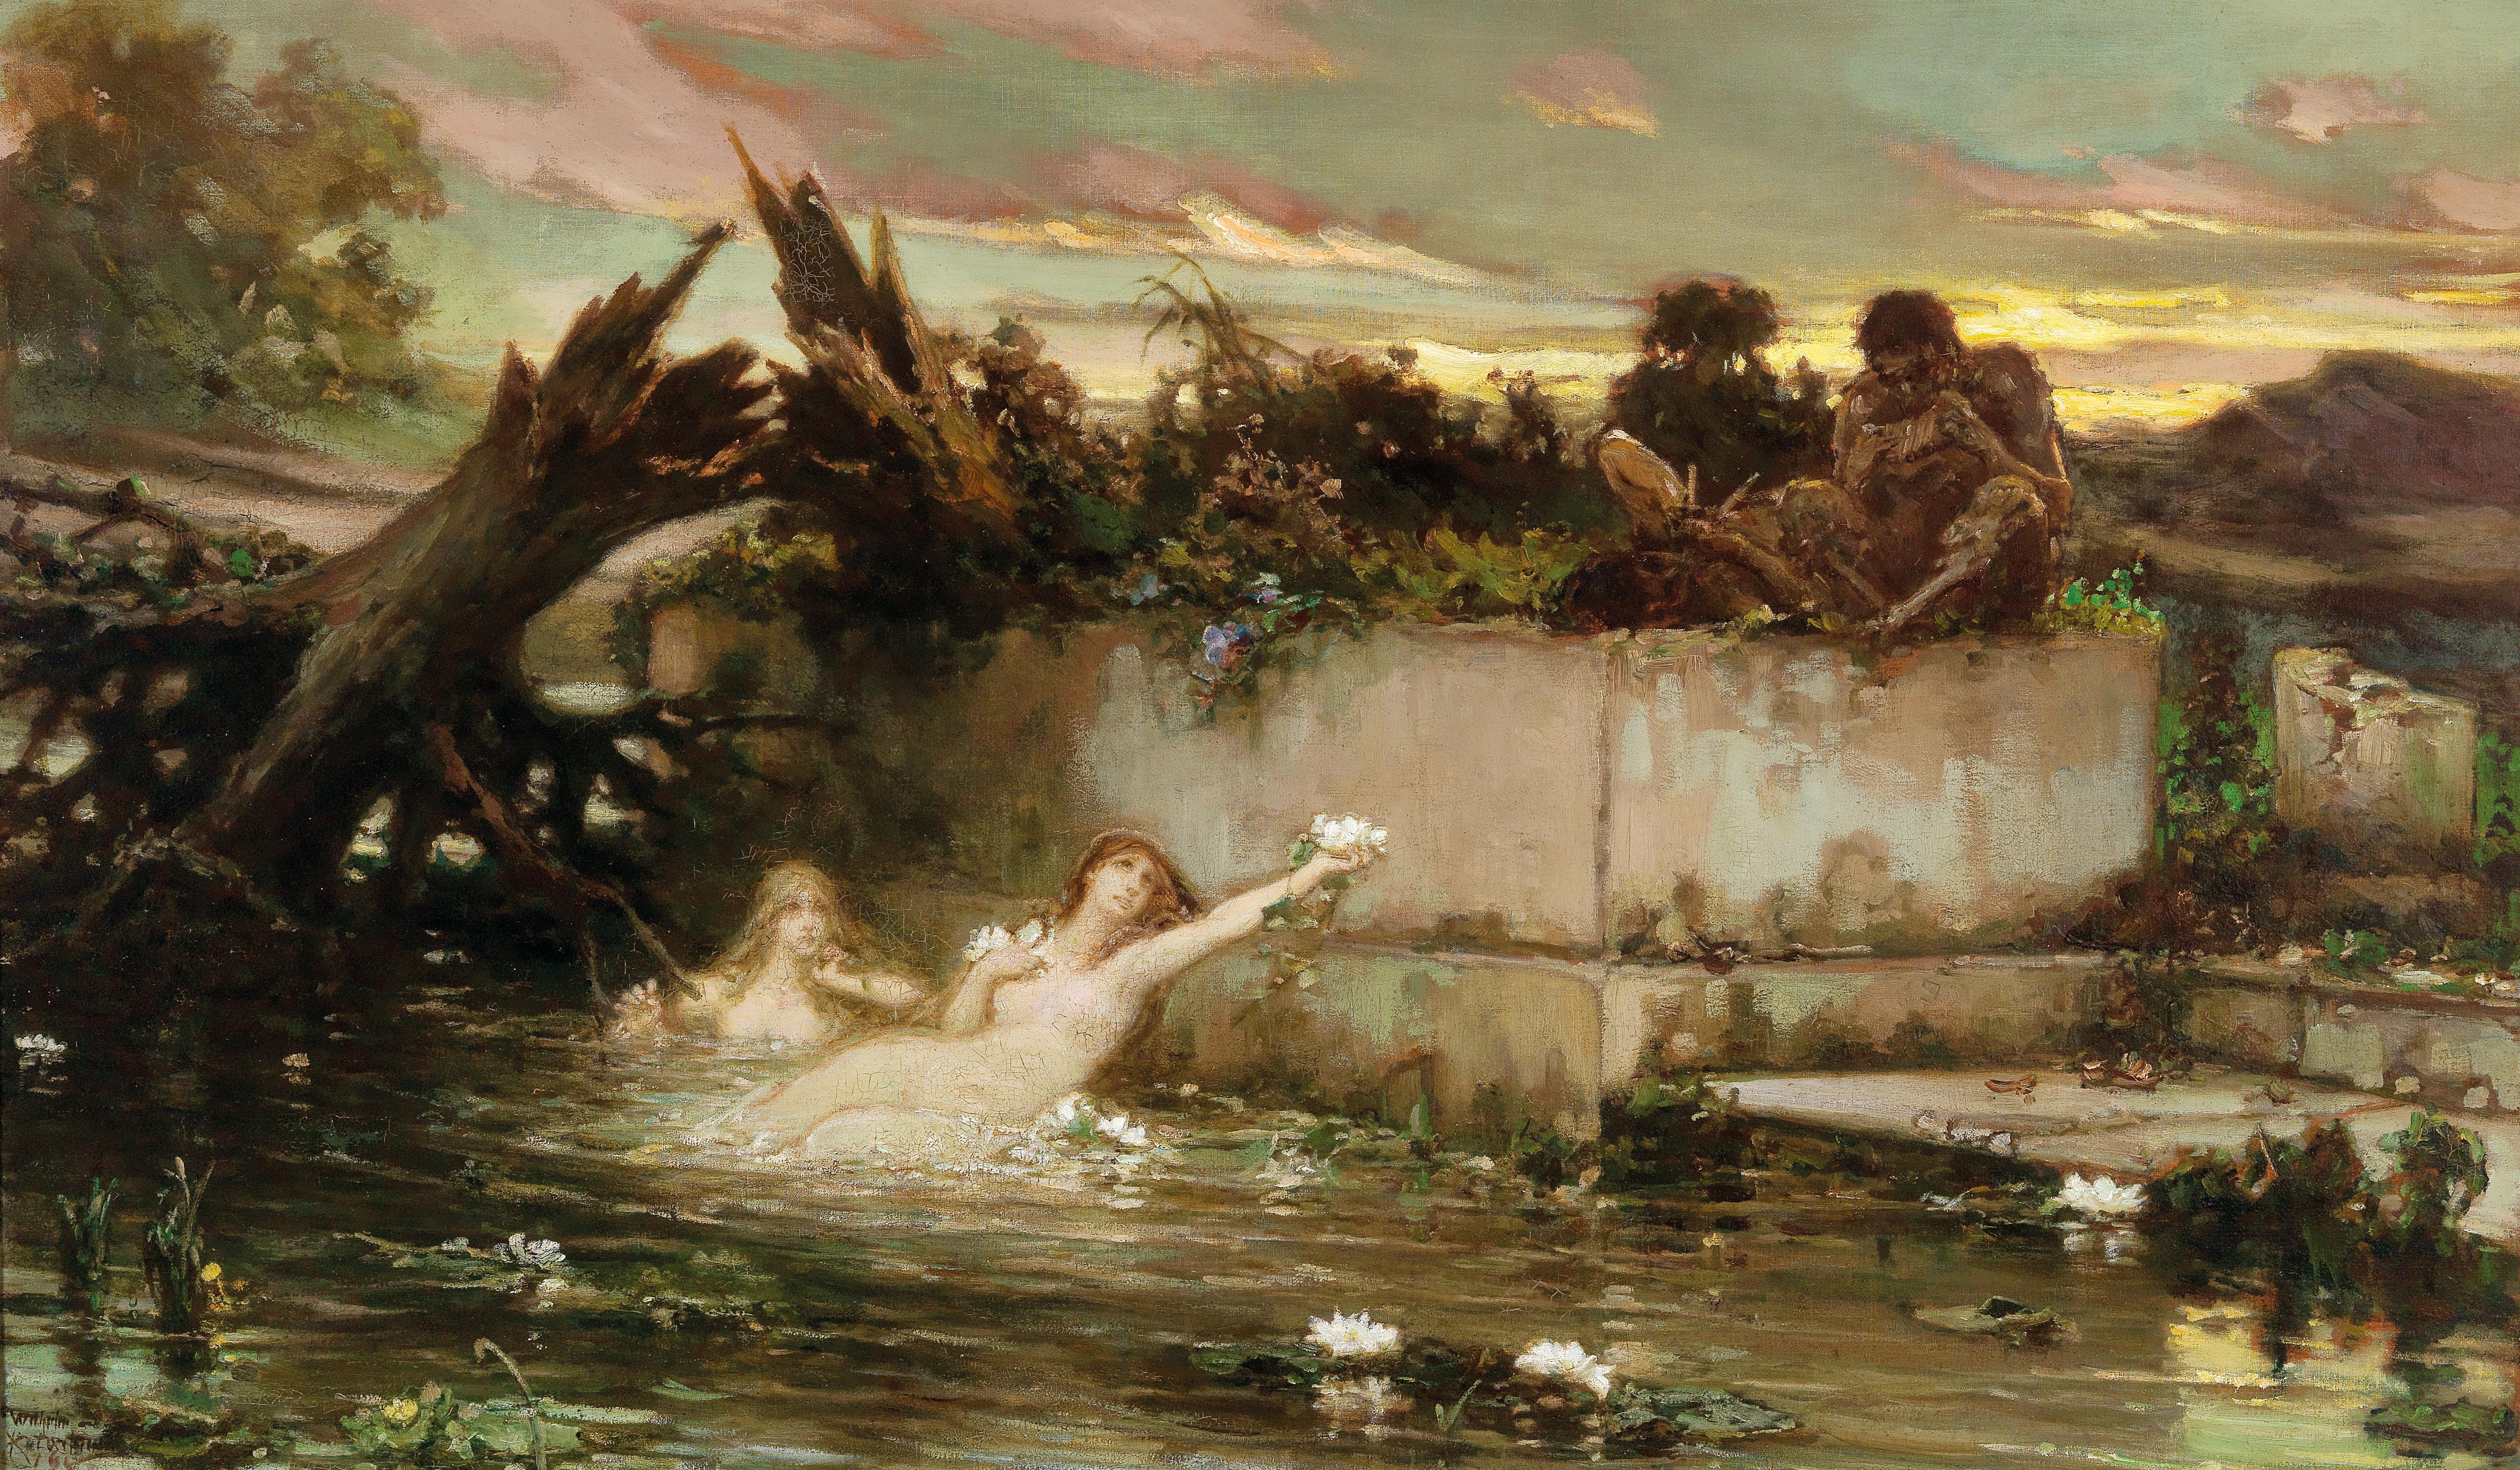 Wilhelm Kotarbiński (1849–1921) Sunset, Nereids and flute playing fauns in the twilight, 1903 (?) oil on canvas 94.5 x 160.5 cm, estimate € 45,000 – 65,000